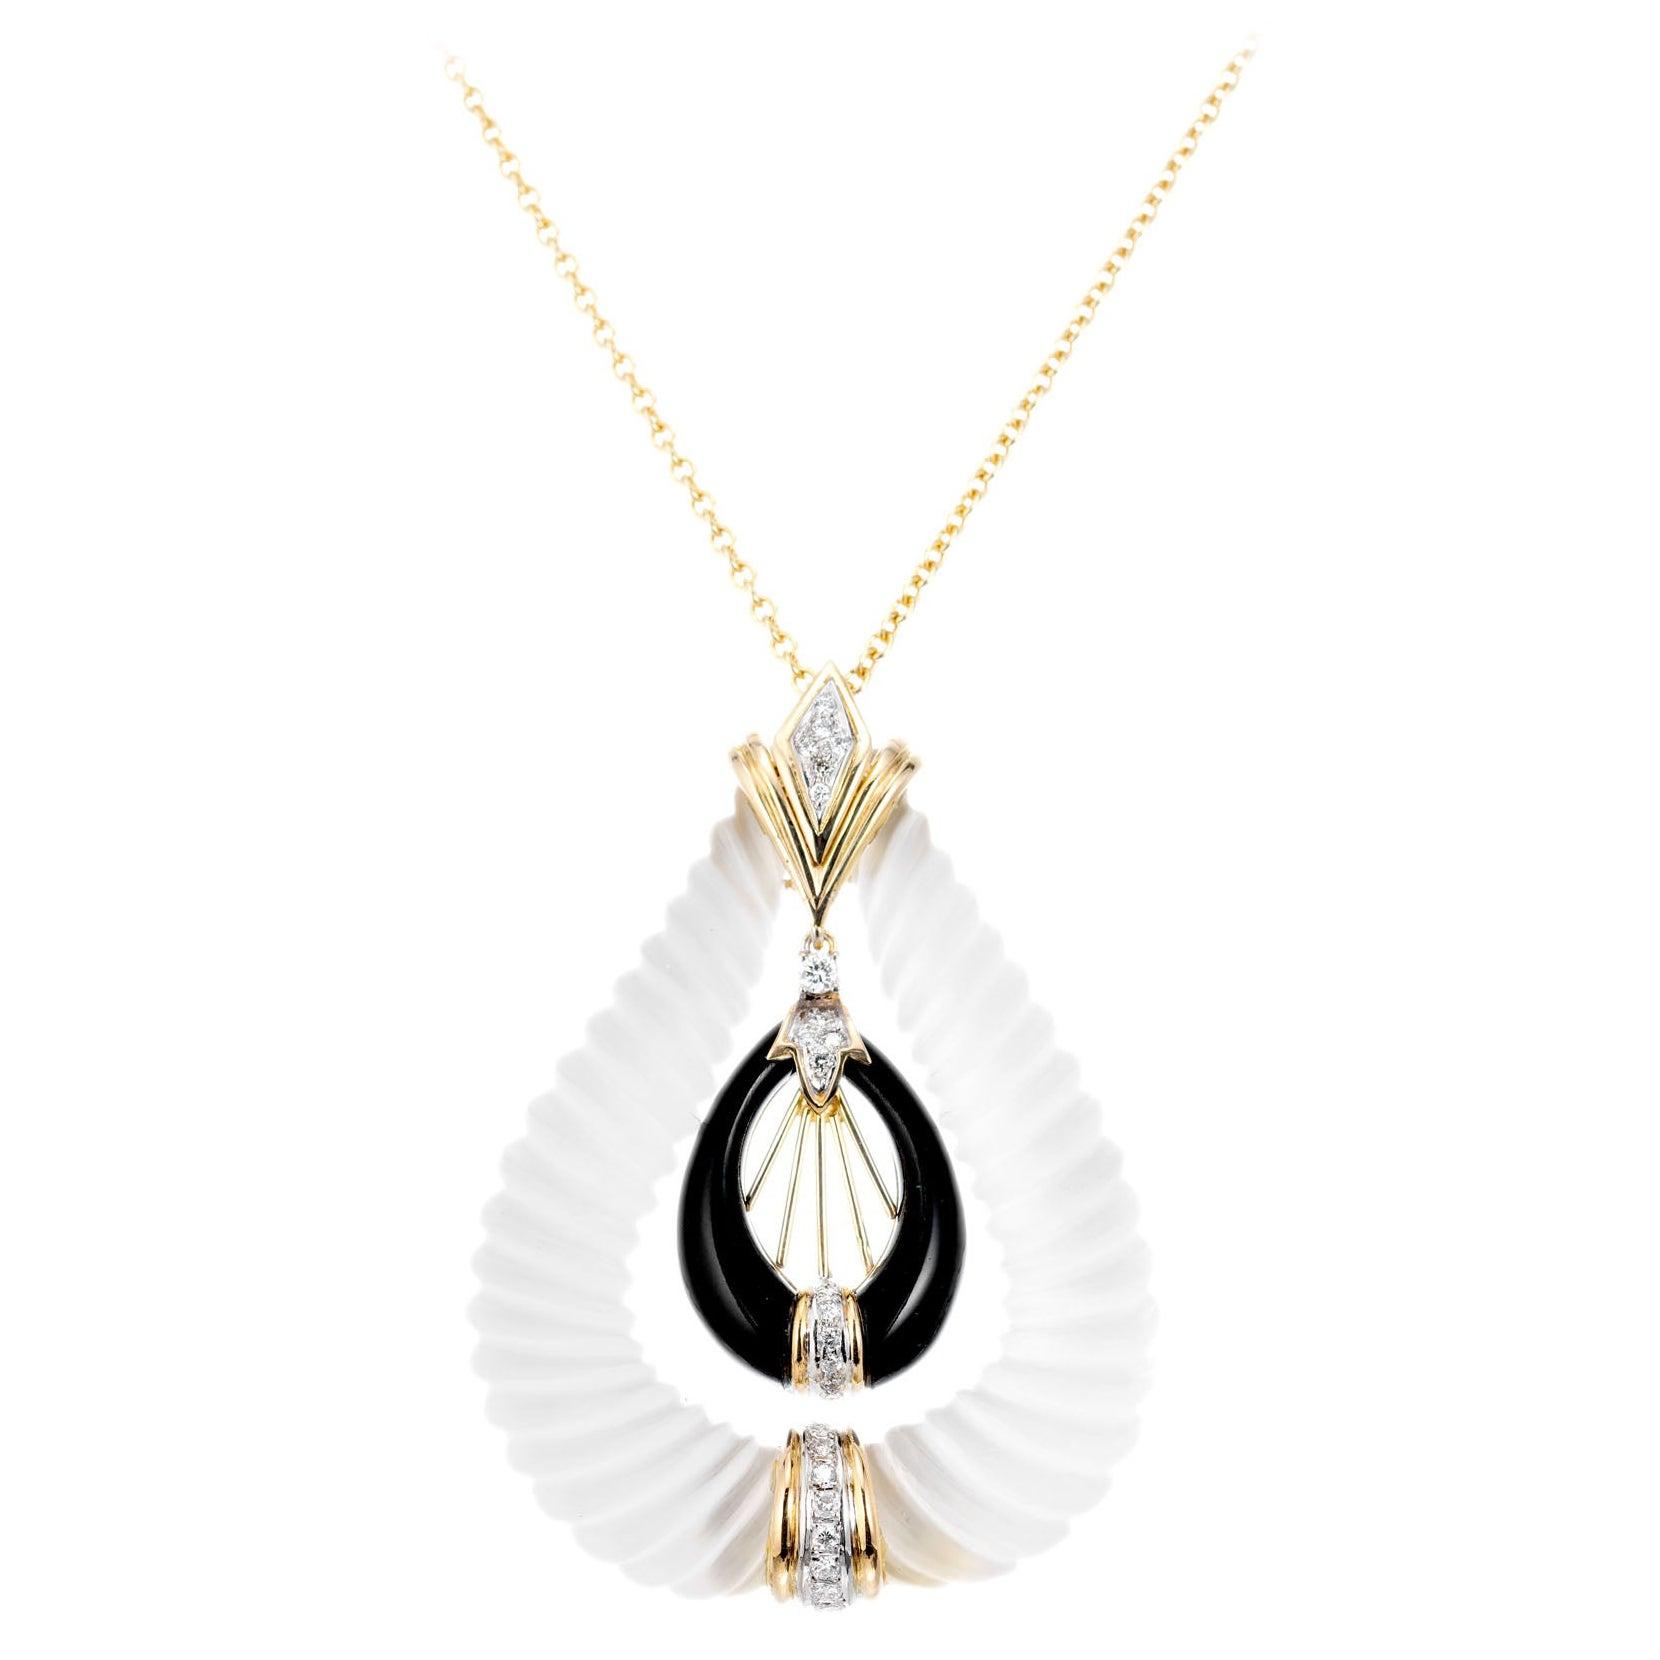 .40 Carat Diamond Quartz Onyx Yellow Gold Pendant Necklace